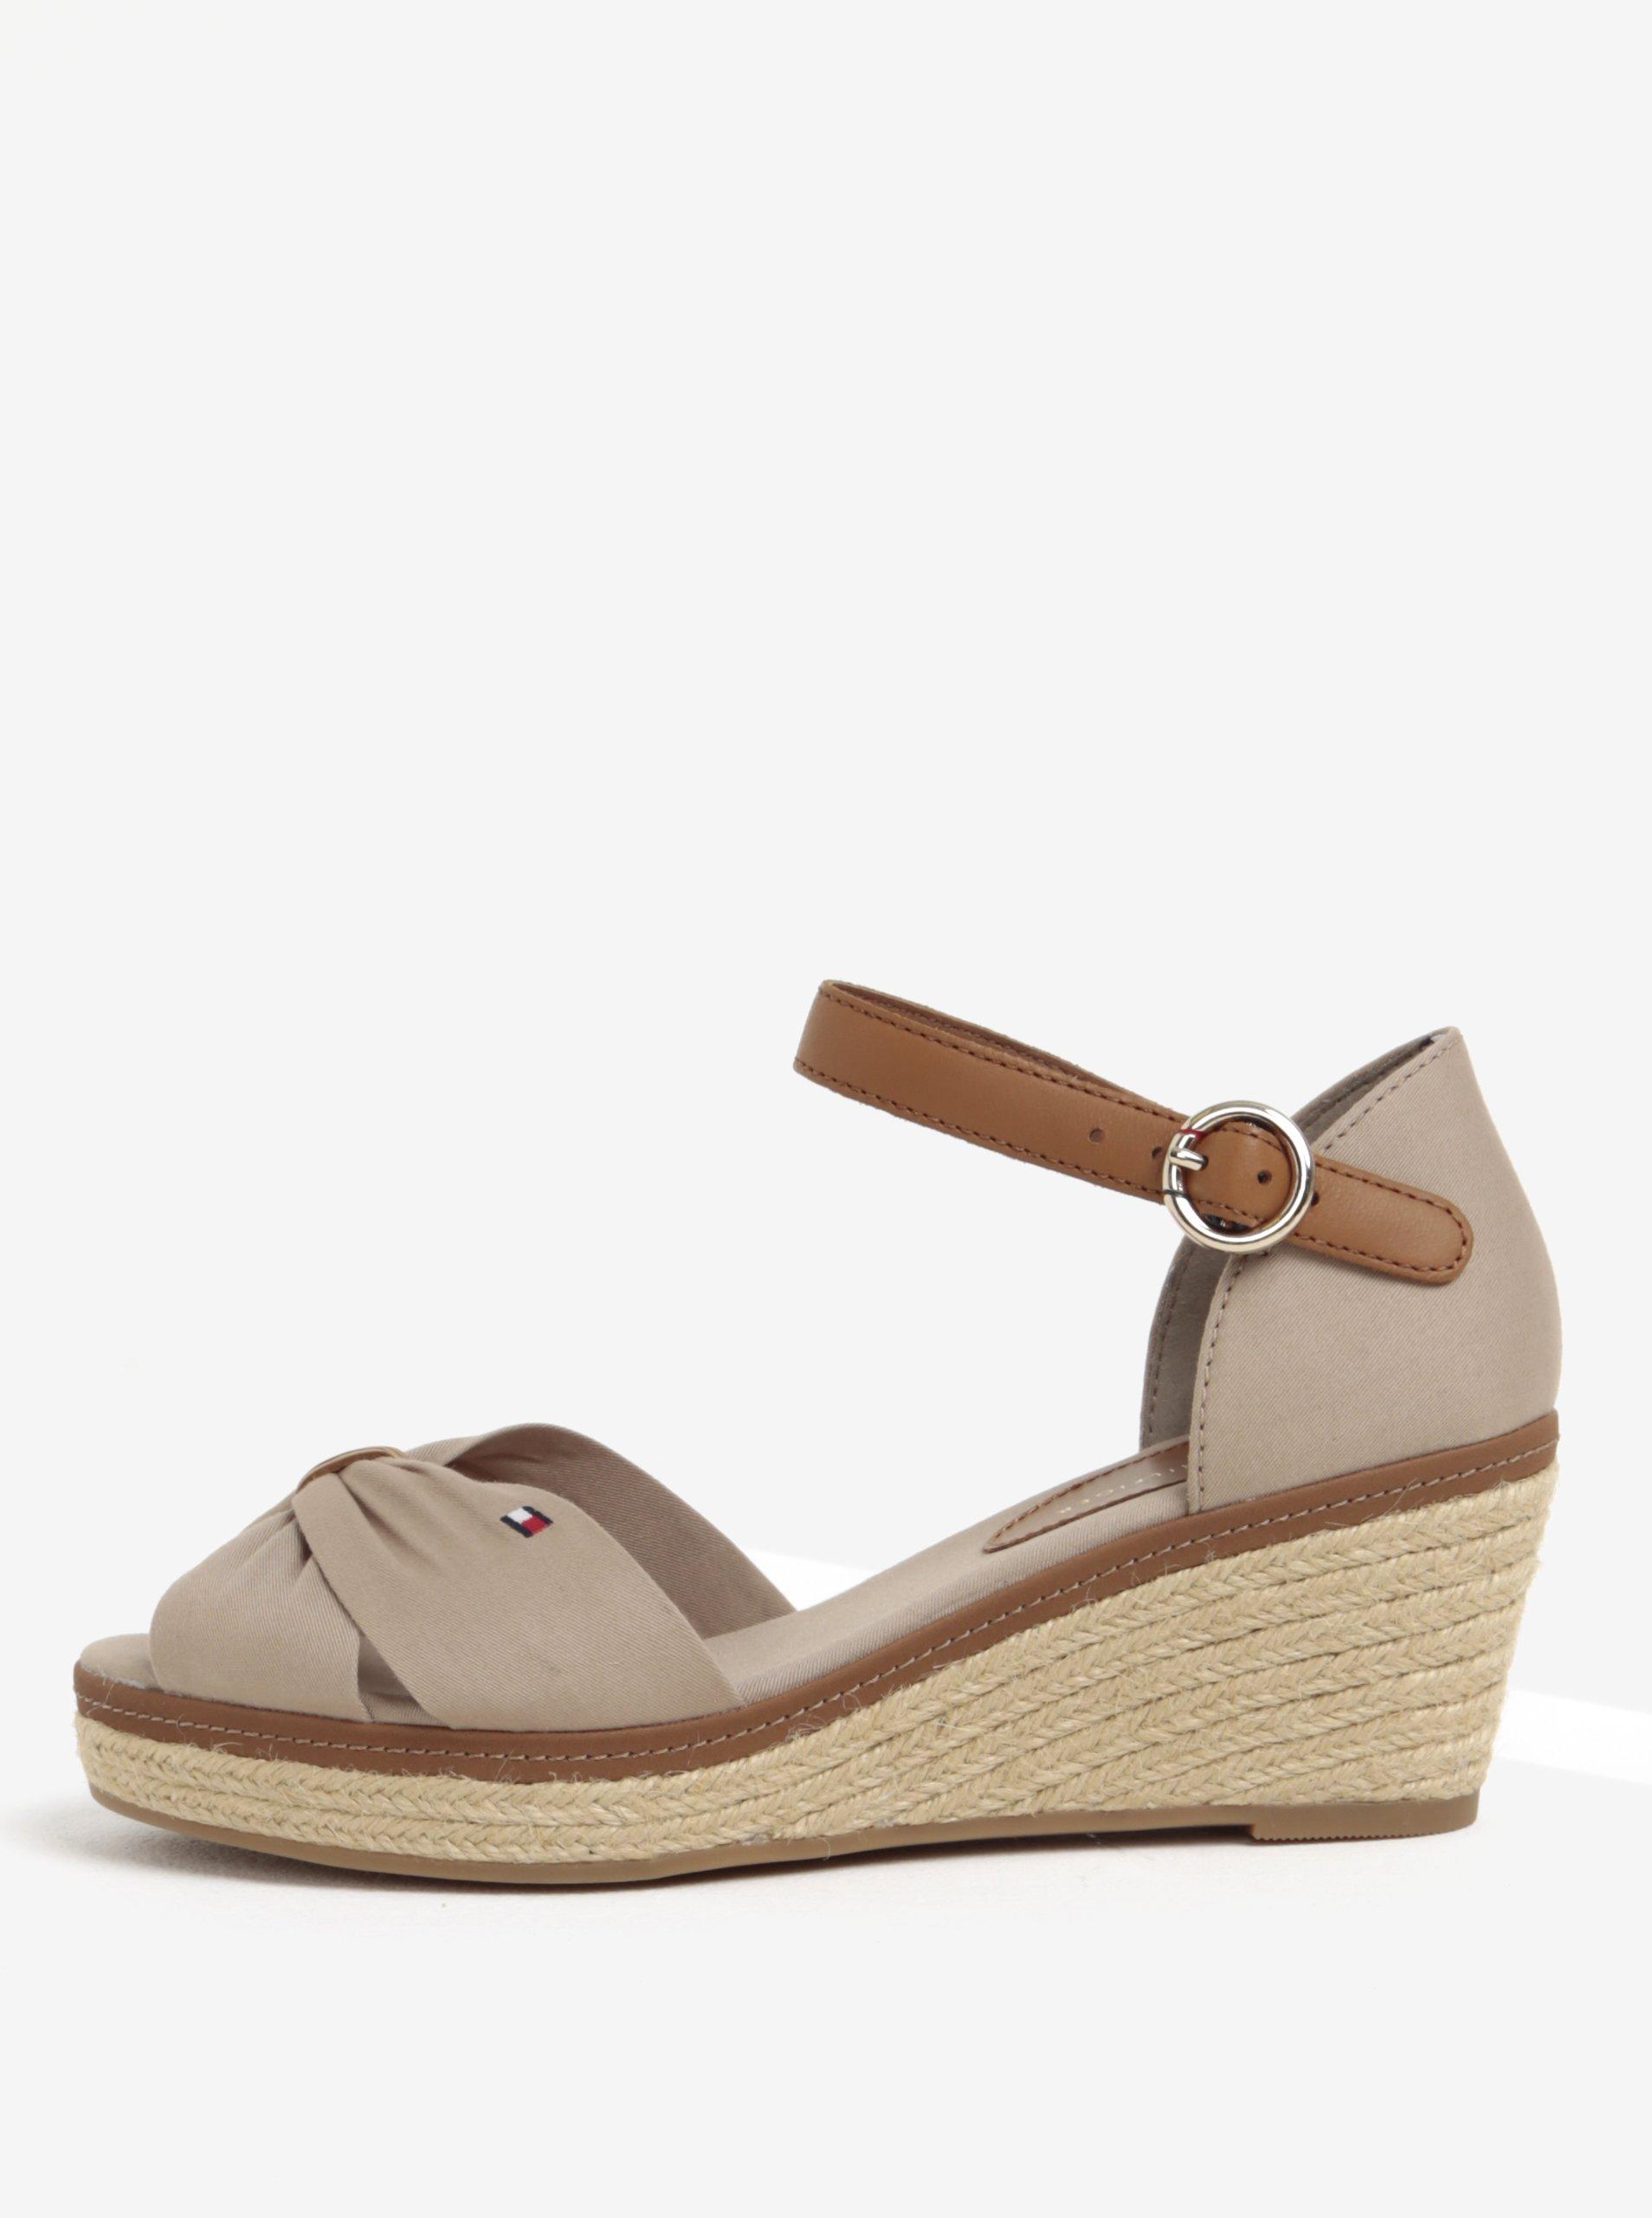 73bf03a0782f Béžové sandále na klinovom podpätku Tommy Hilfiger